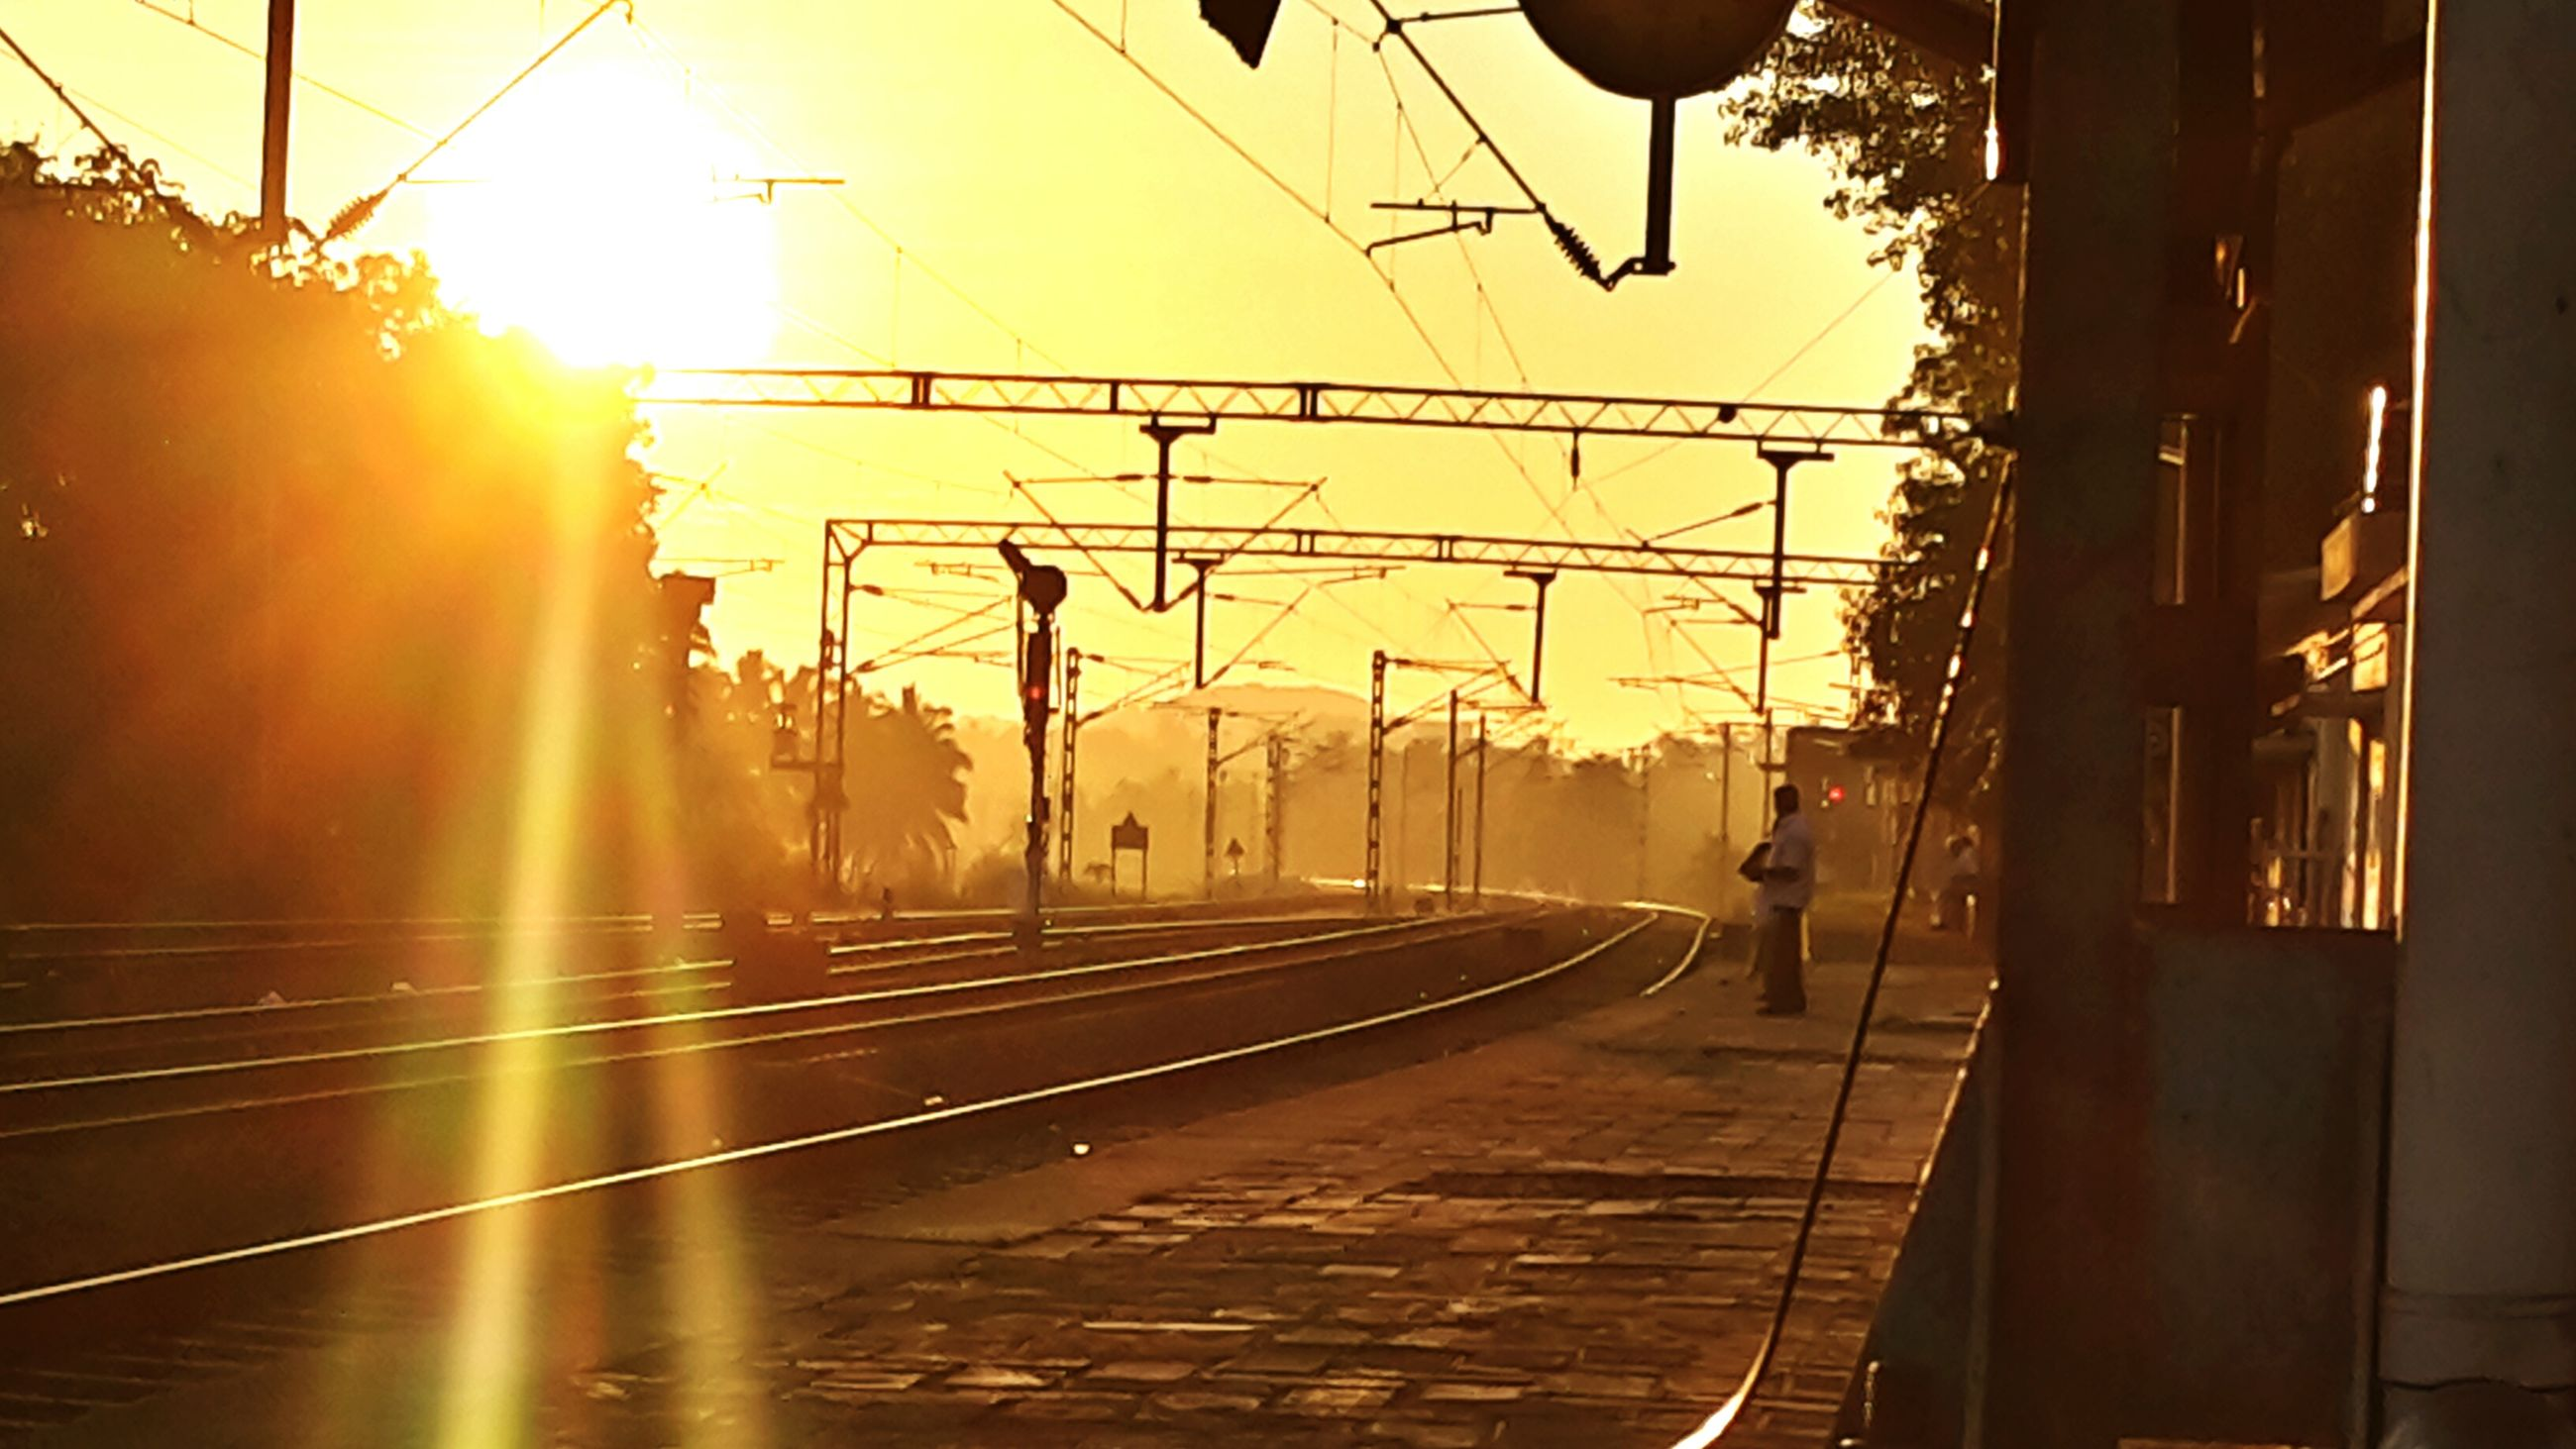 sunset, sun, sunlight, transportation, street light, tree, silhouette, power line, lens flare, sunbeam, sky, street, electricity pylon, orange color, built structure, clear sky, building exterior, the way forward, road, city